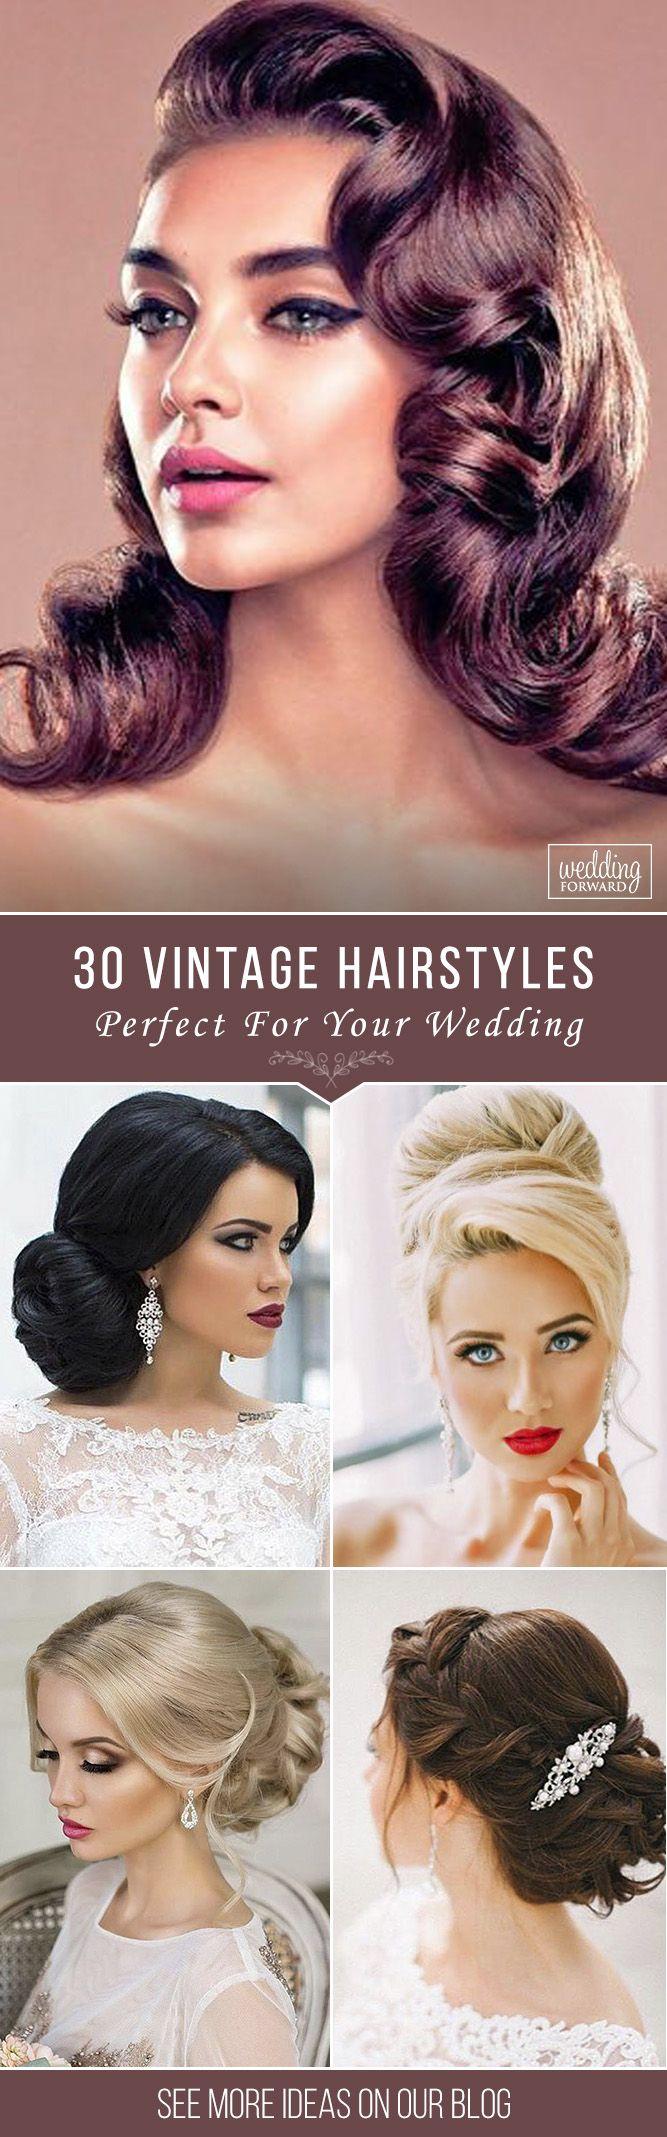 30 Pintrest Vintage Bridal Hairstyles 50s Hairstyles Ideas Walk